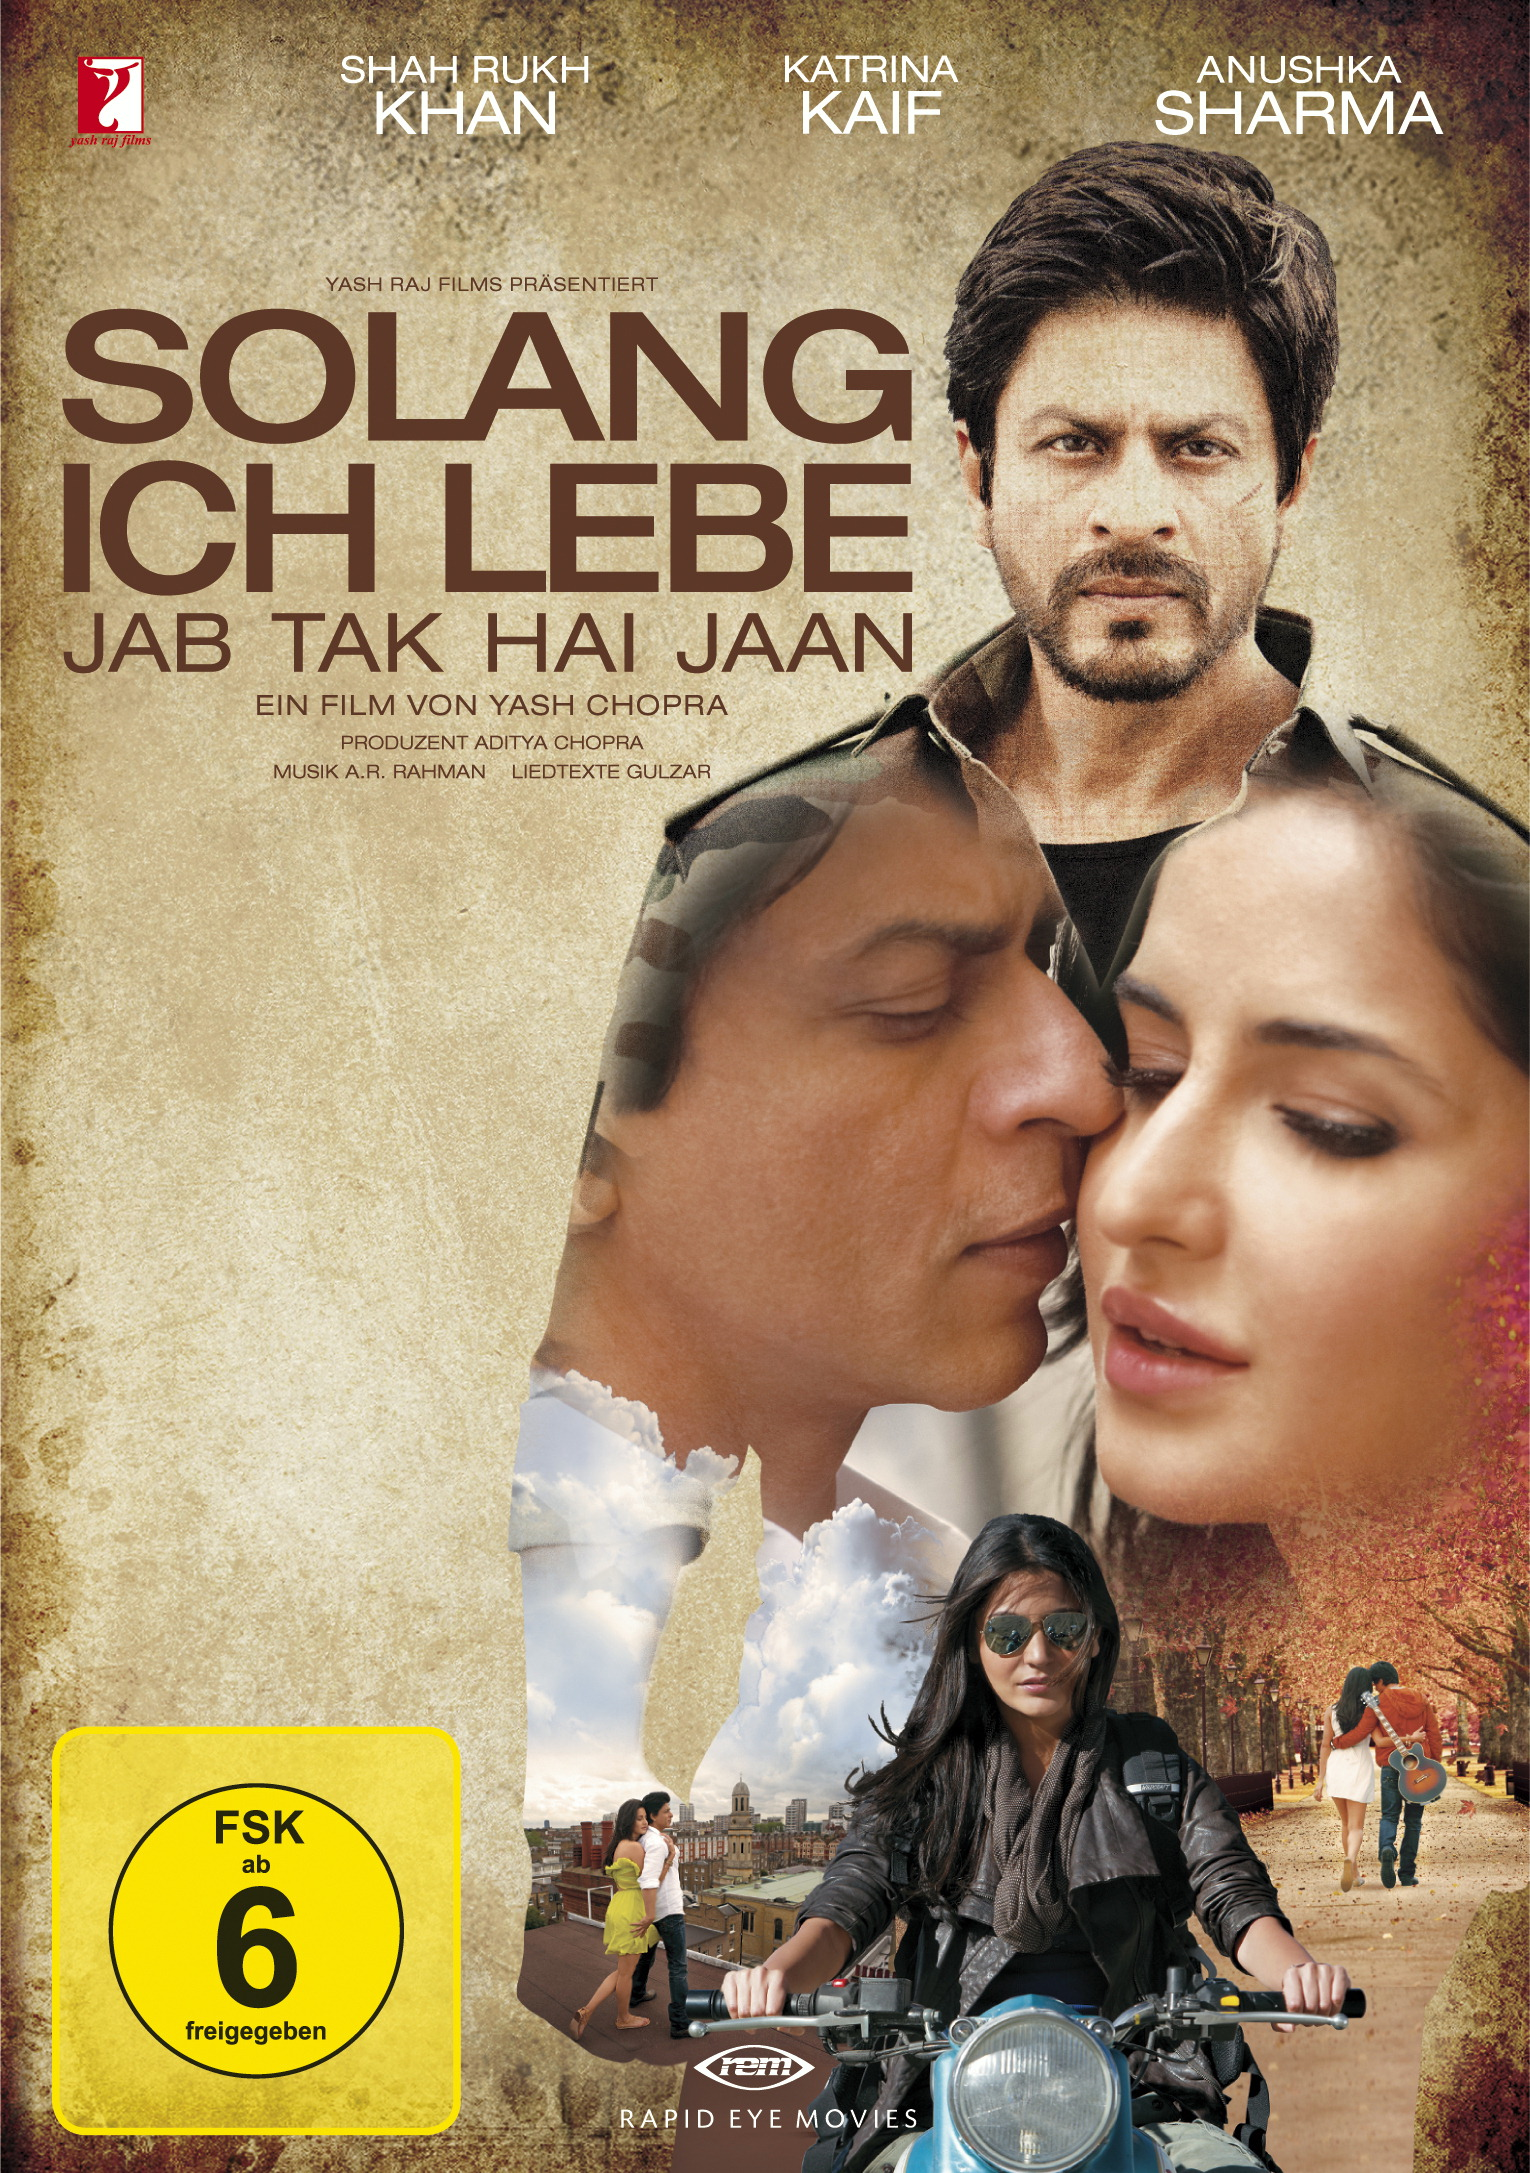 Solang ich lebe - Jab Tak Hai Jaan (2 Discs) Poster